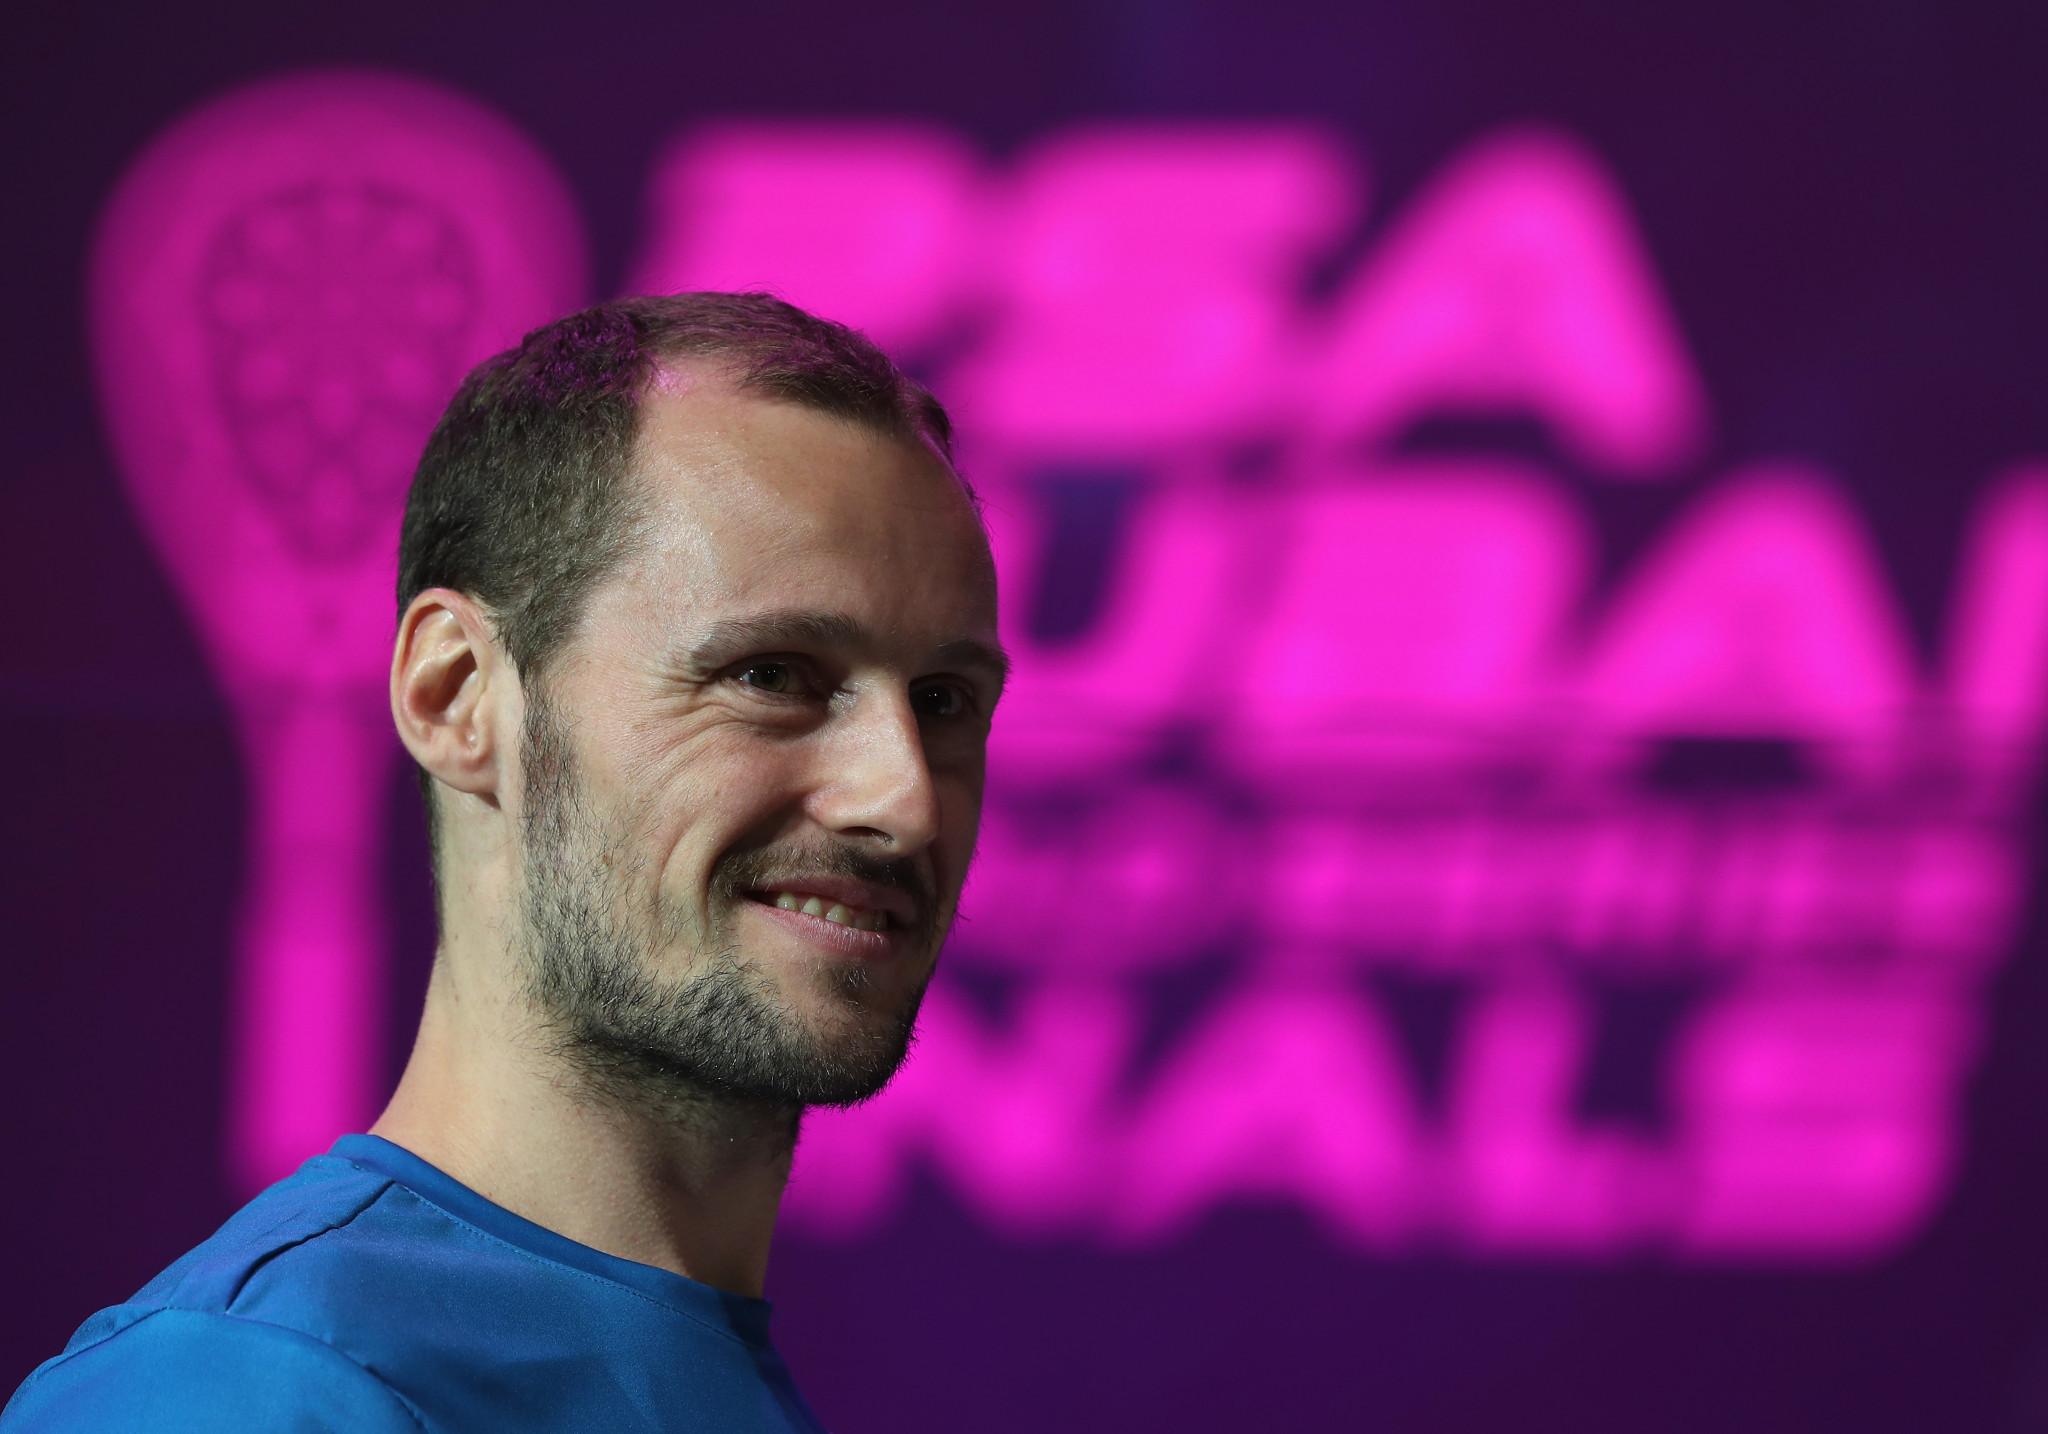 Former world squash champion Gaultier undergoes knee surgery